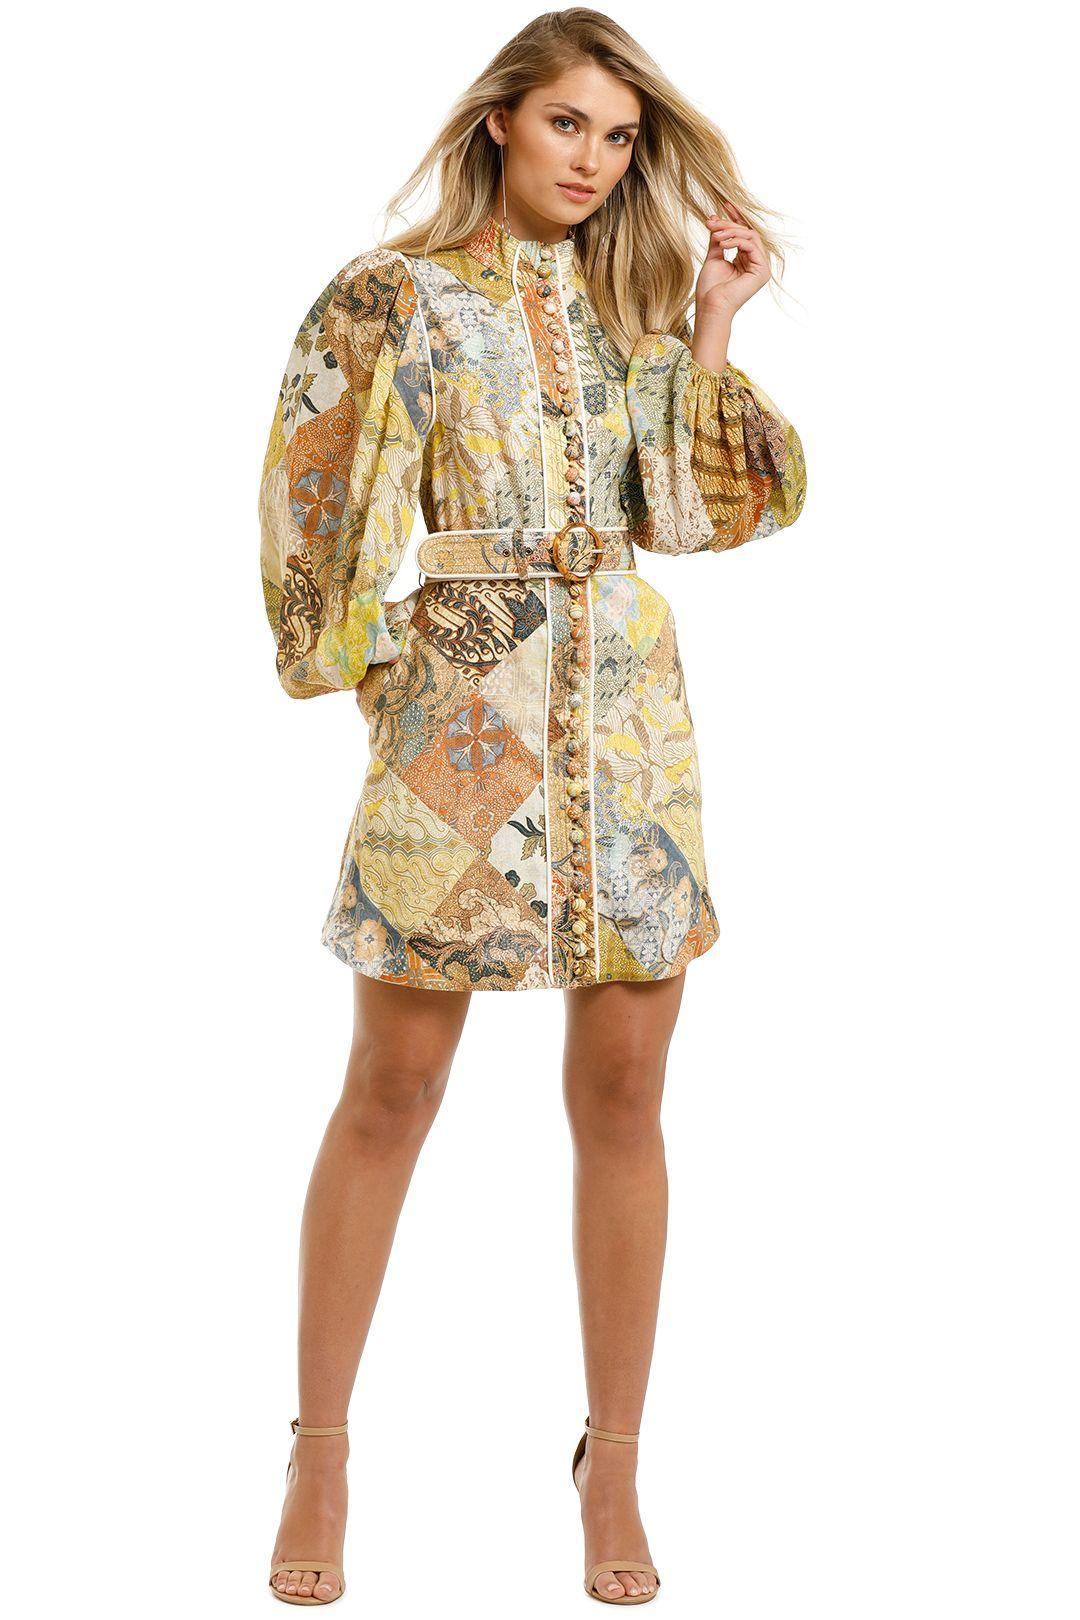 Zimmermann-Brightside-A-Line-Mini-Dress-Batik-Patch-Front